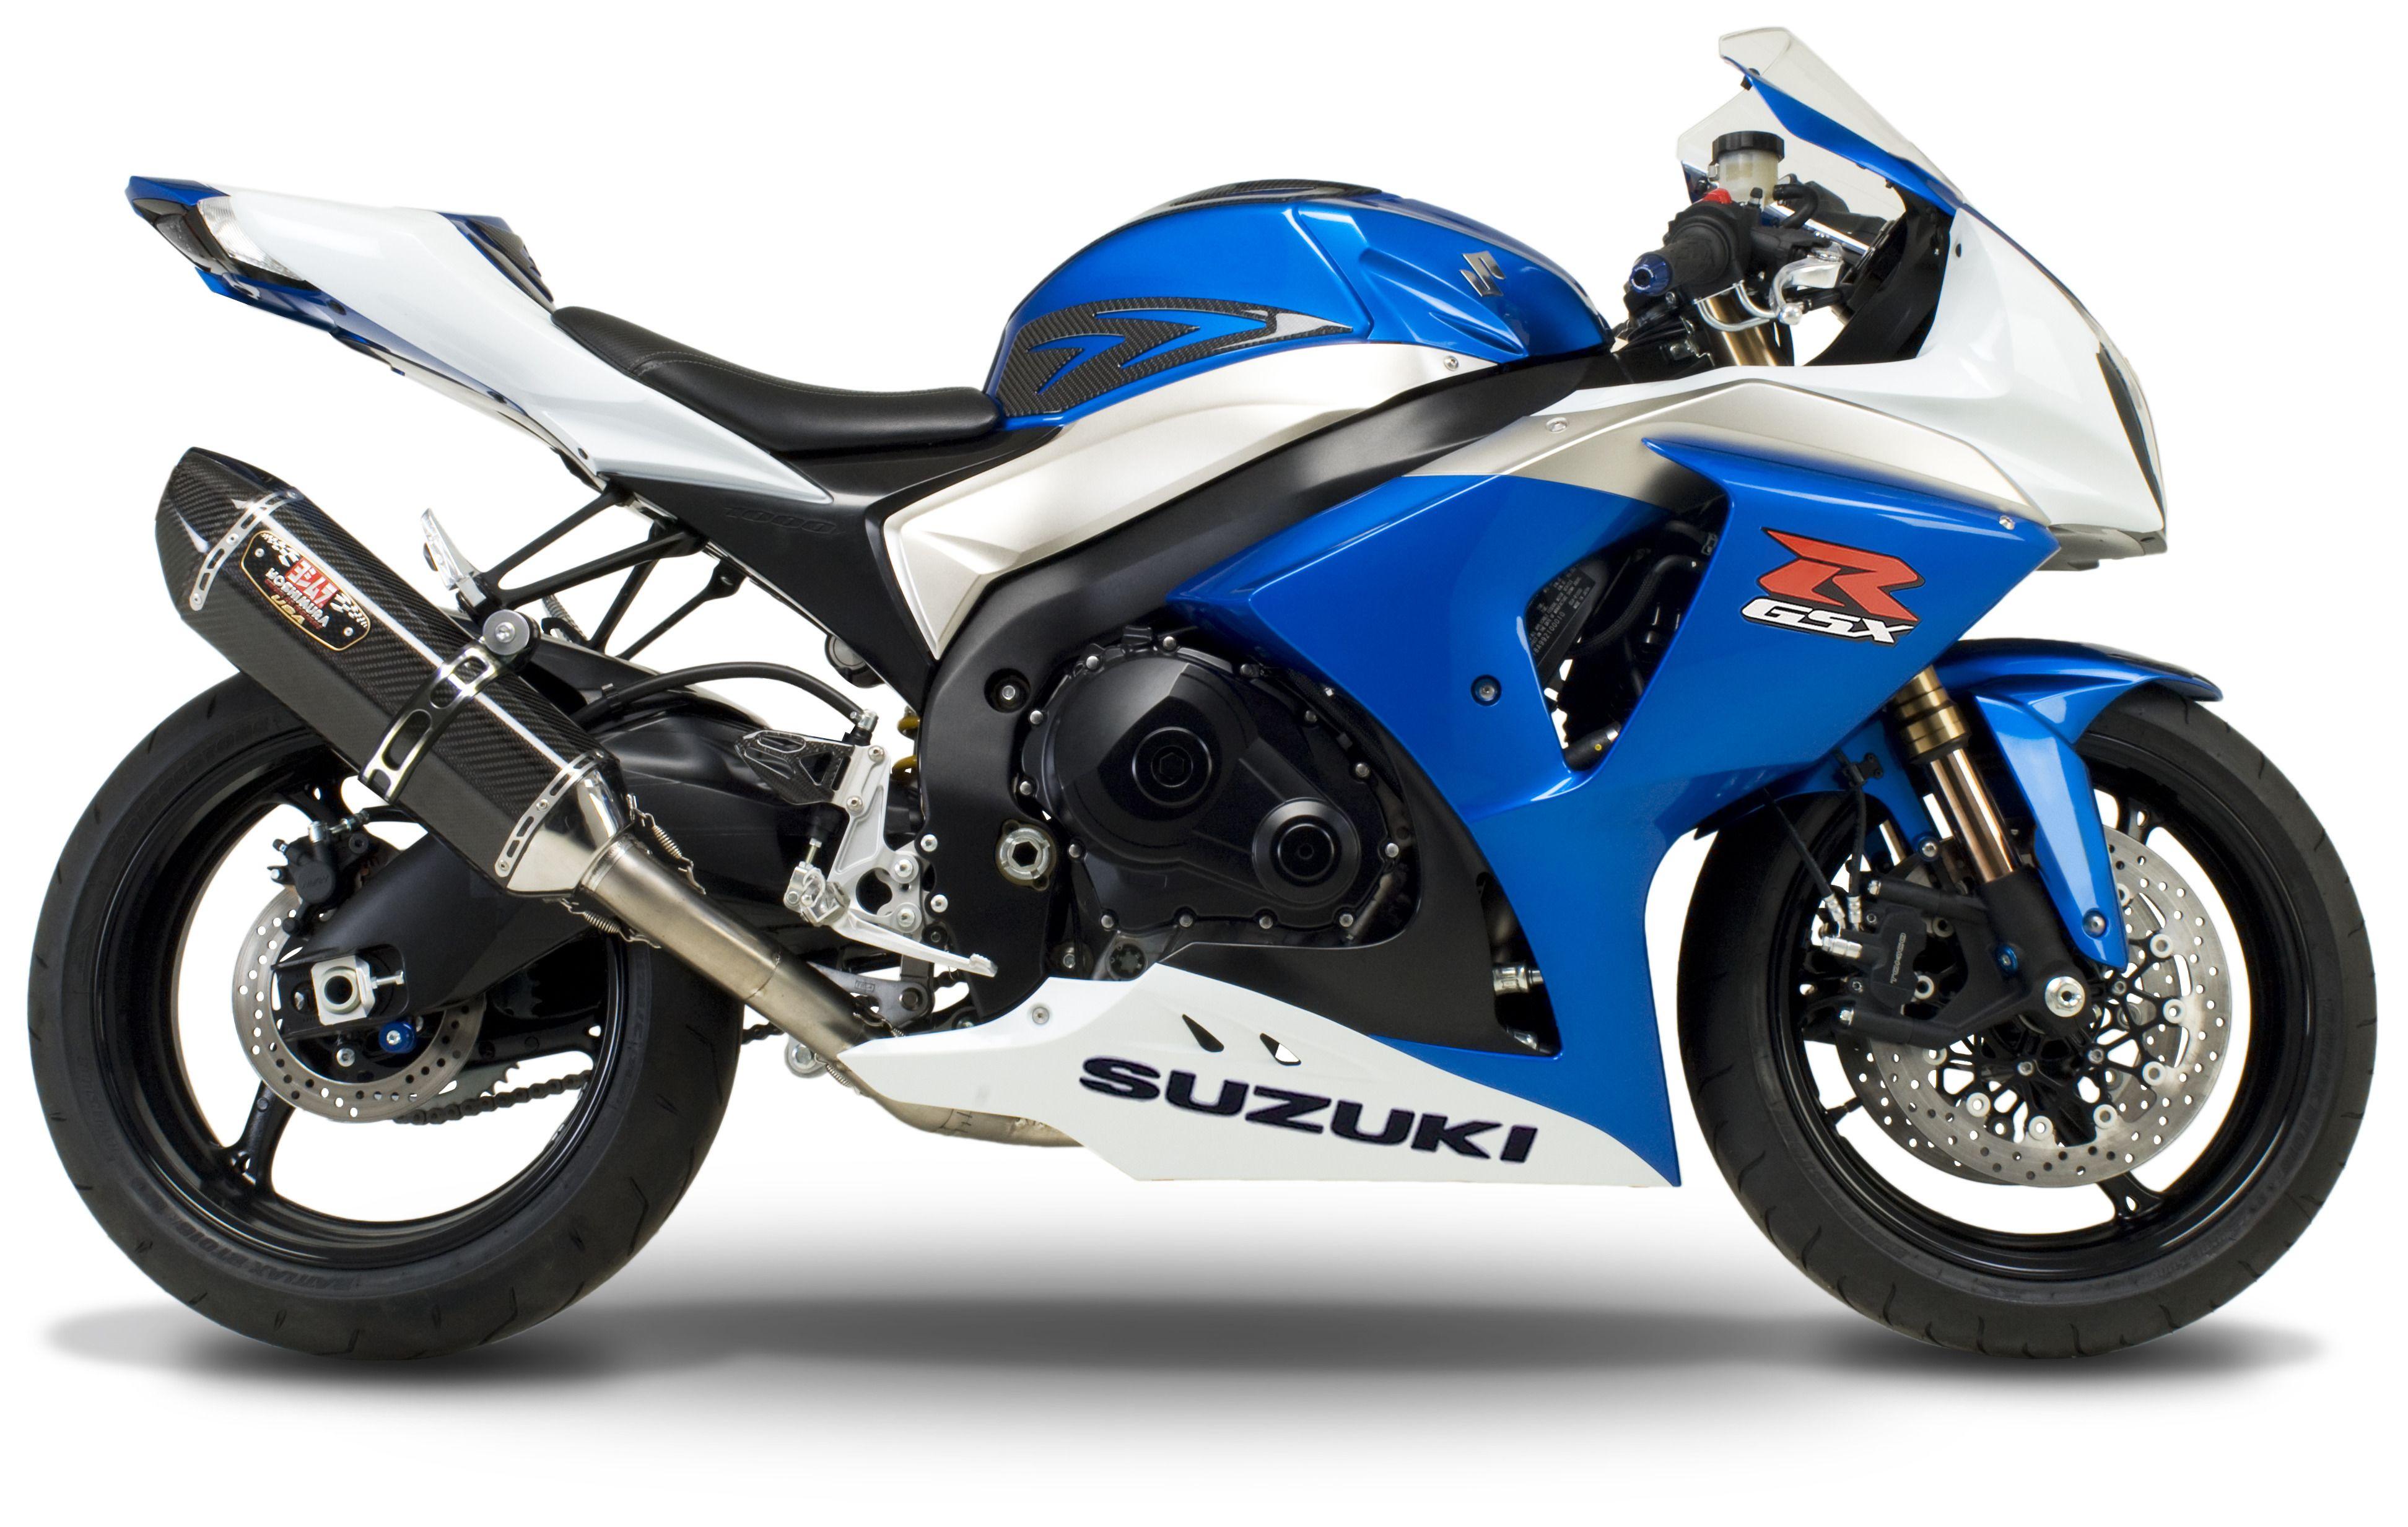 Yoshimura R77 Race Exhaust System Suzuki GSXR 1000 2009-2011